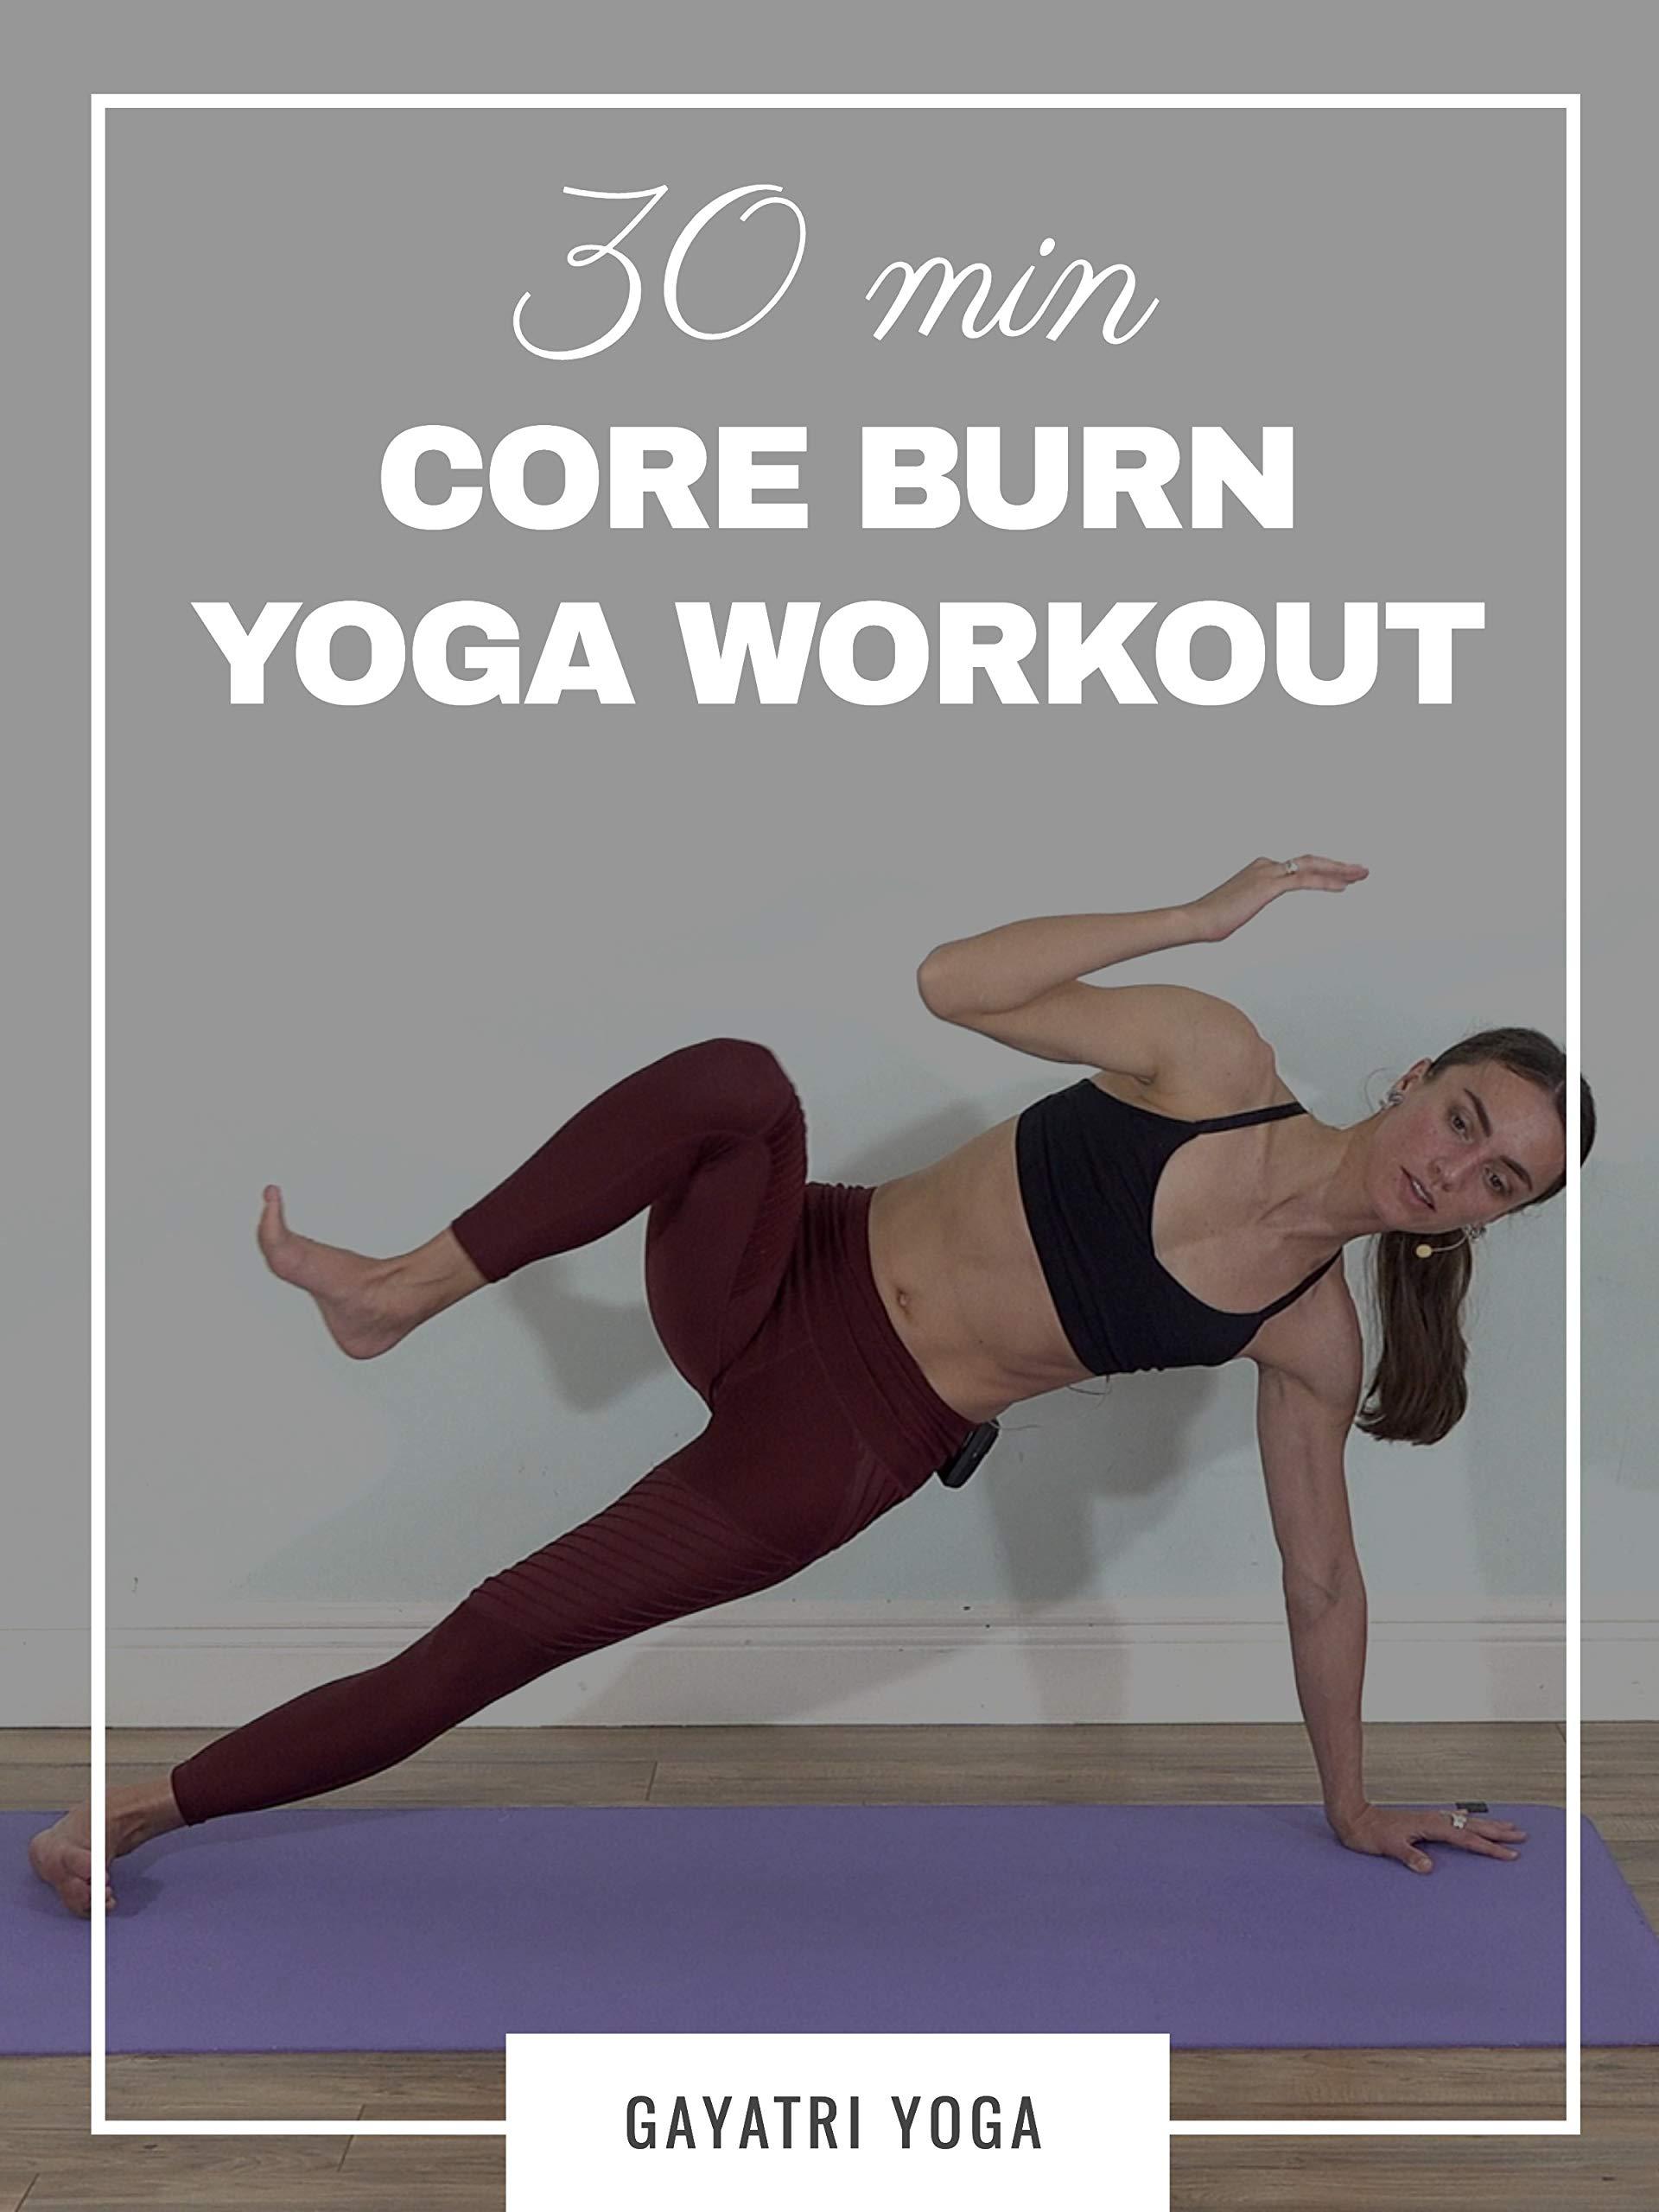 30 Min Core Burn Yoga Workout | Gayatri Yoga